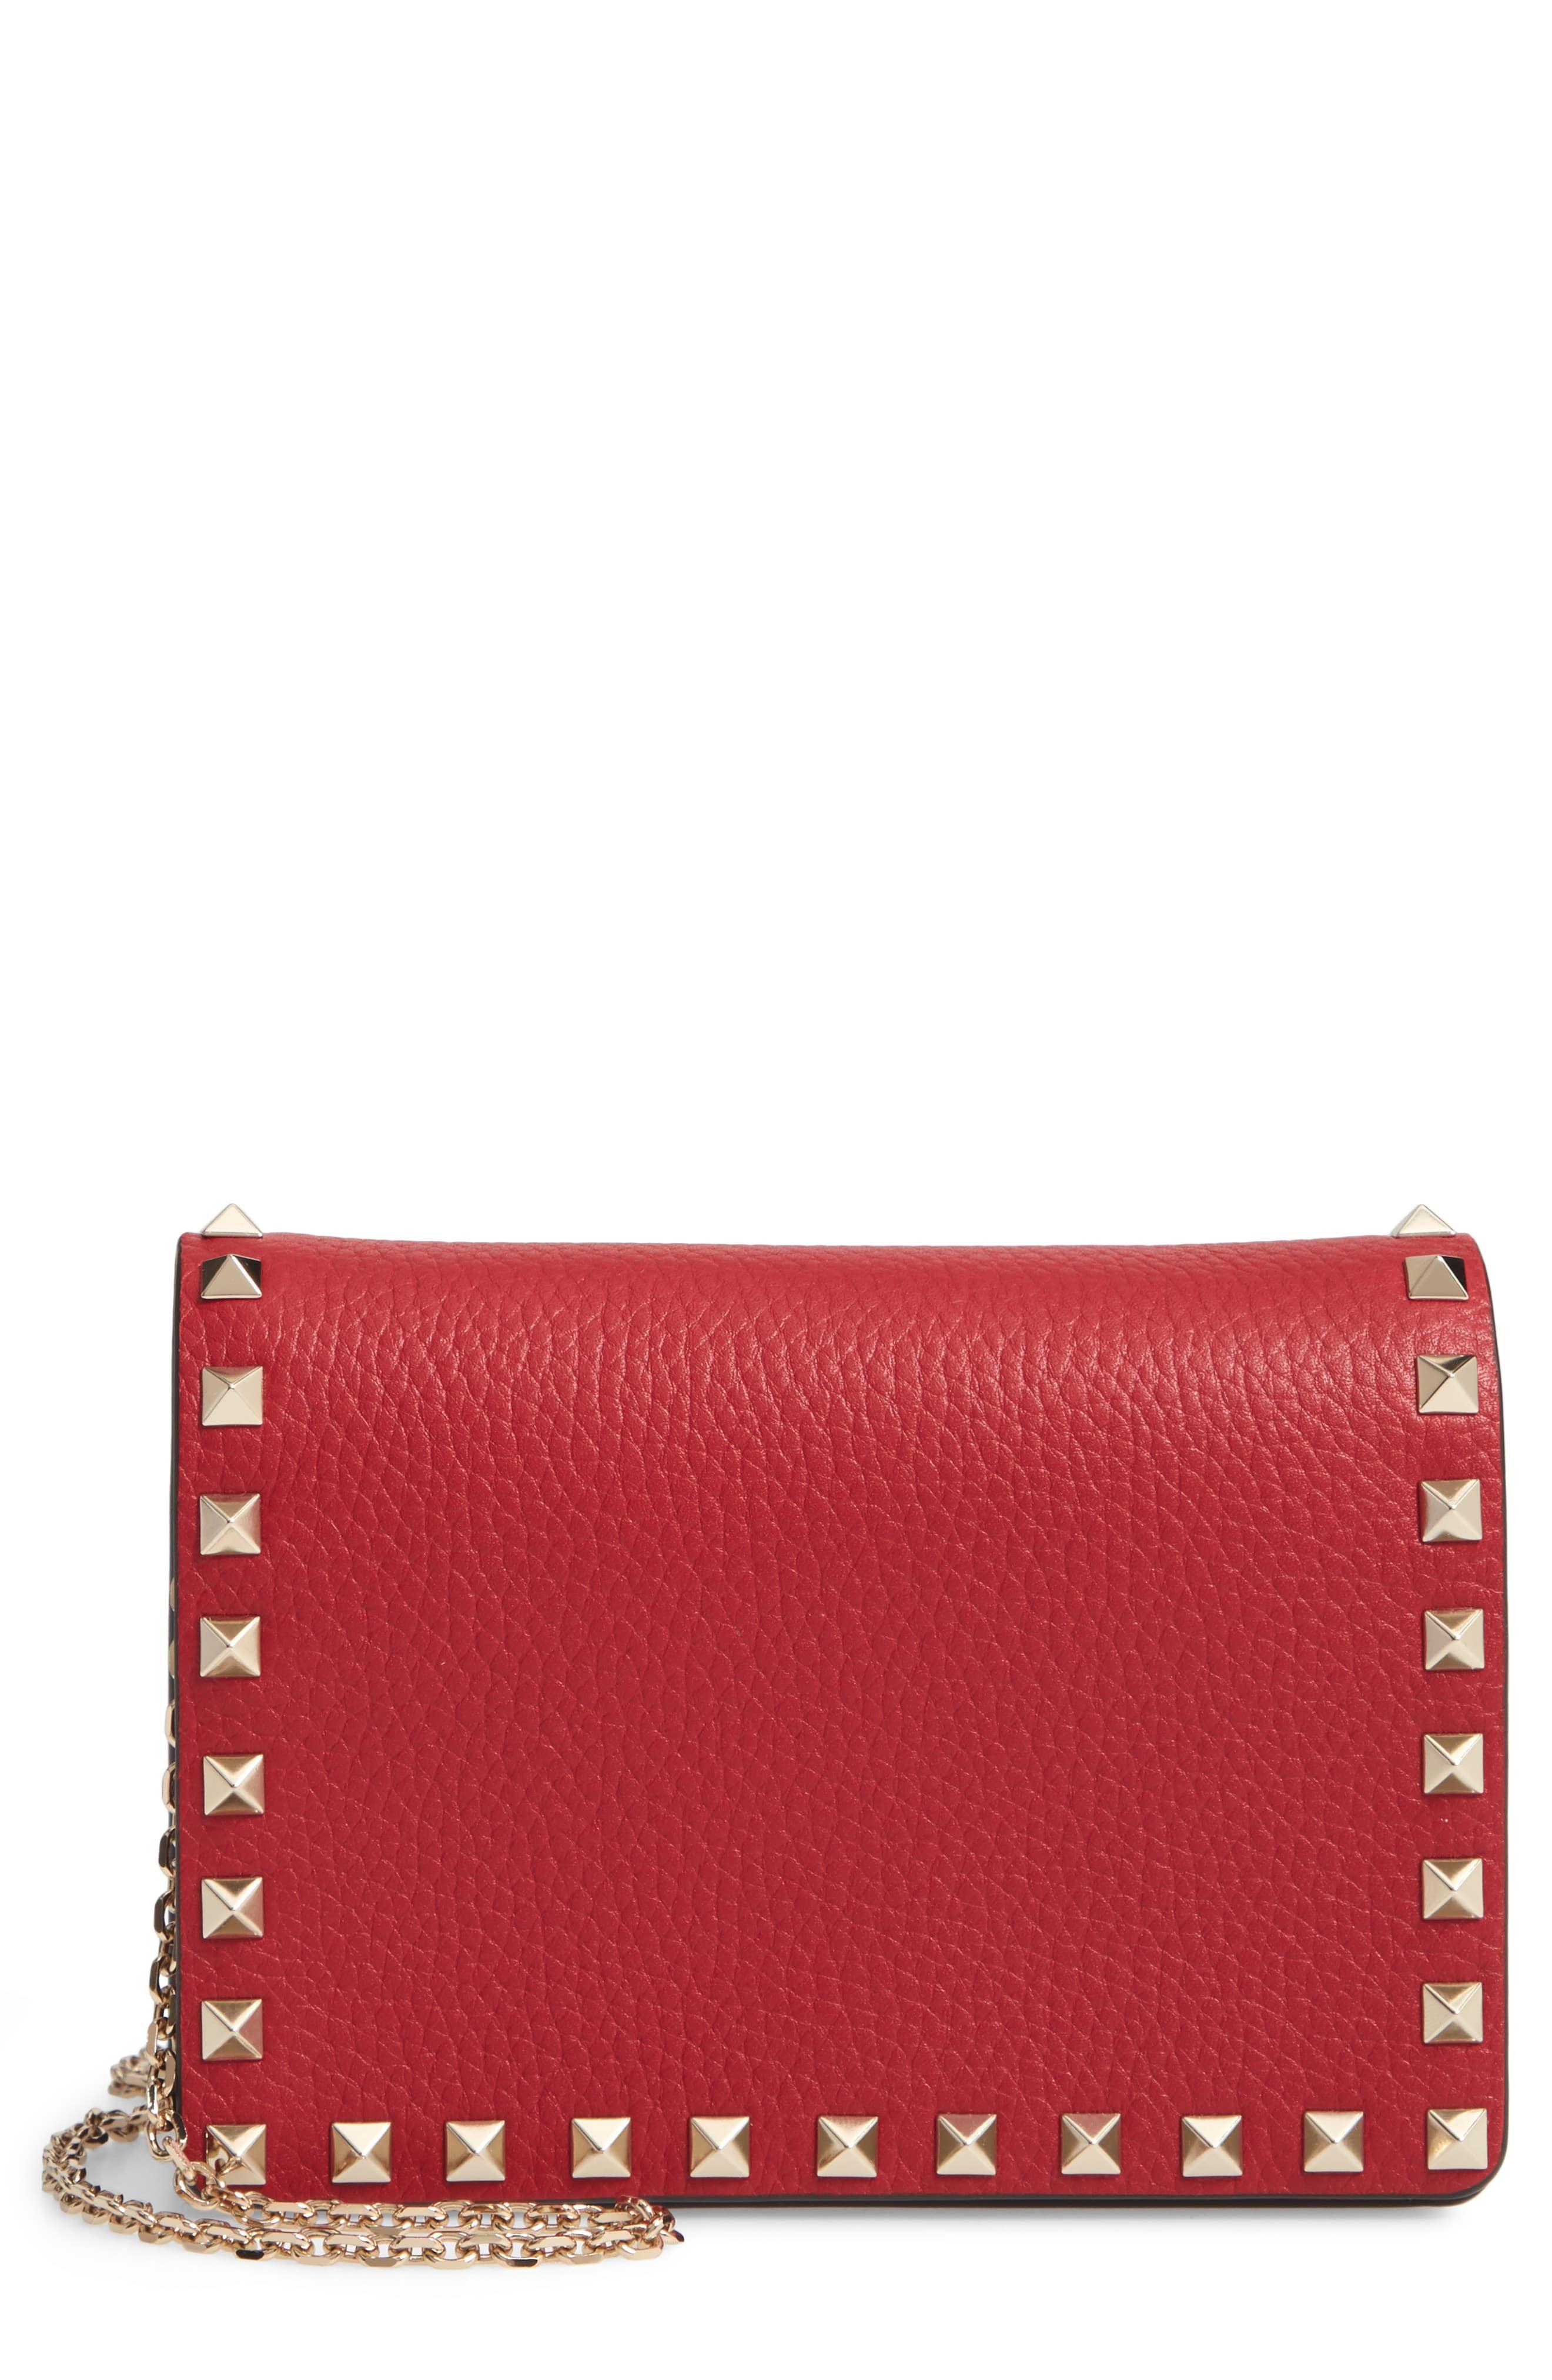 bce7199997eb8 Women's Valentino Garavani Rockstud Leather Pouch Wallet On A Chain - Red